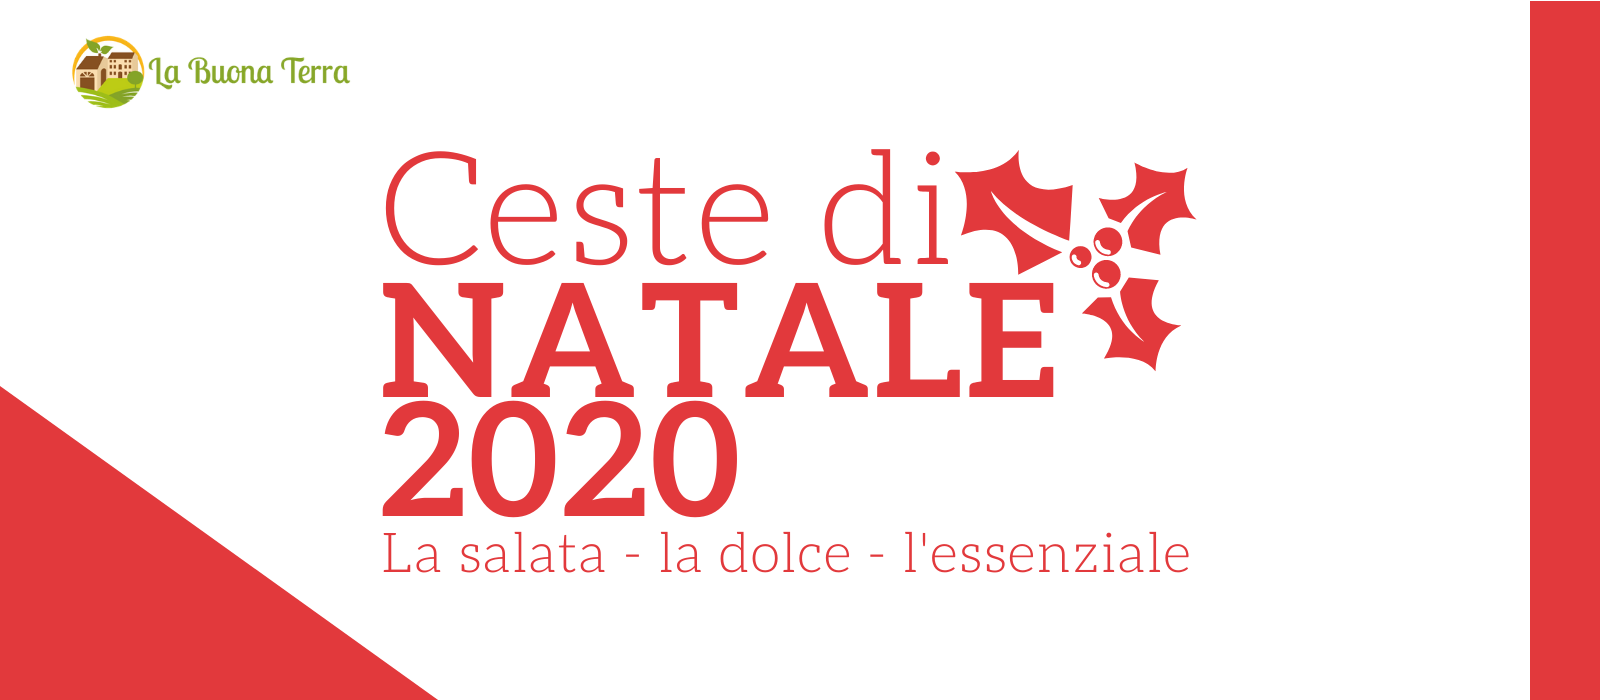 CESTE NATALE 2020 LANDING - BUONA TERRA